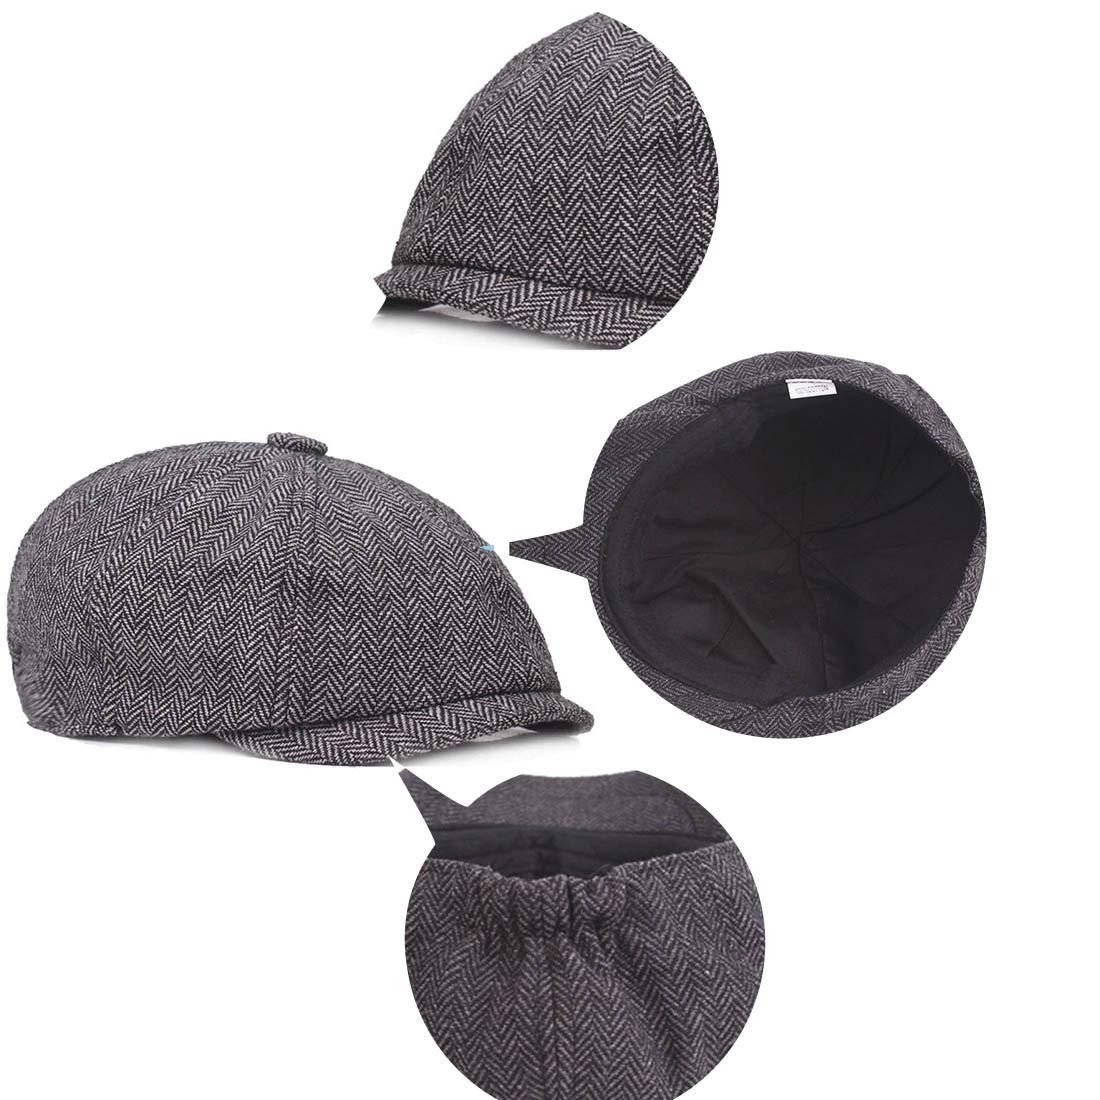 King Star Mens Classic 8 Panel Wool Blend Cabbie Hats Newsboy Herringbone Cap